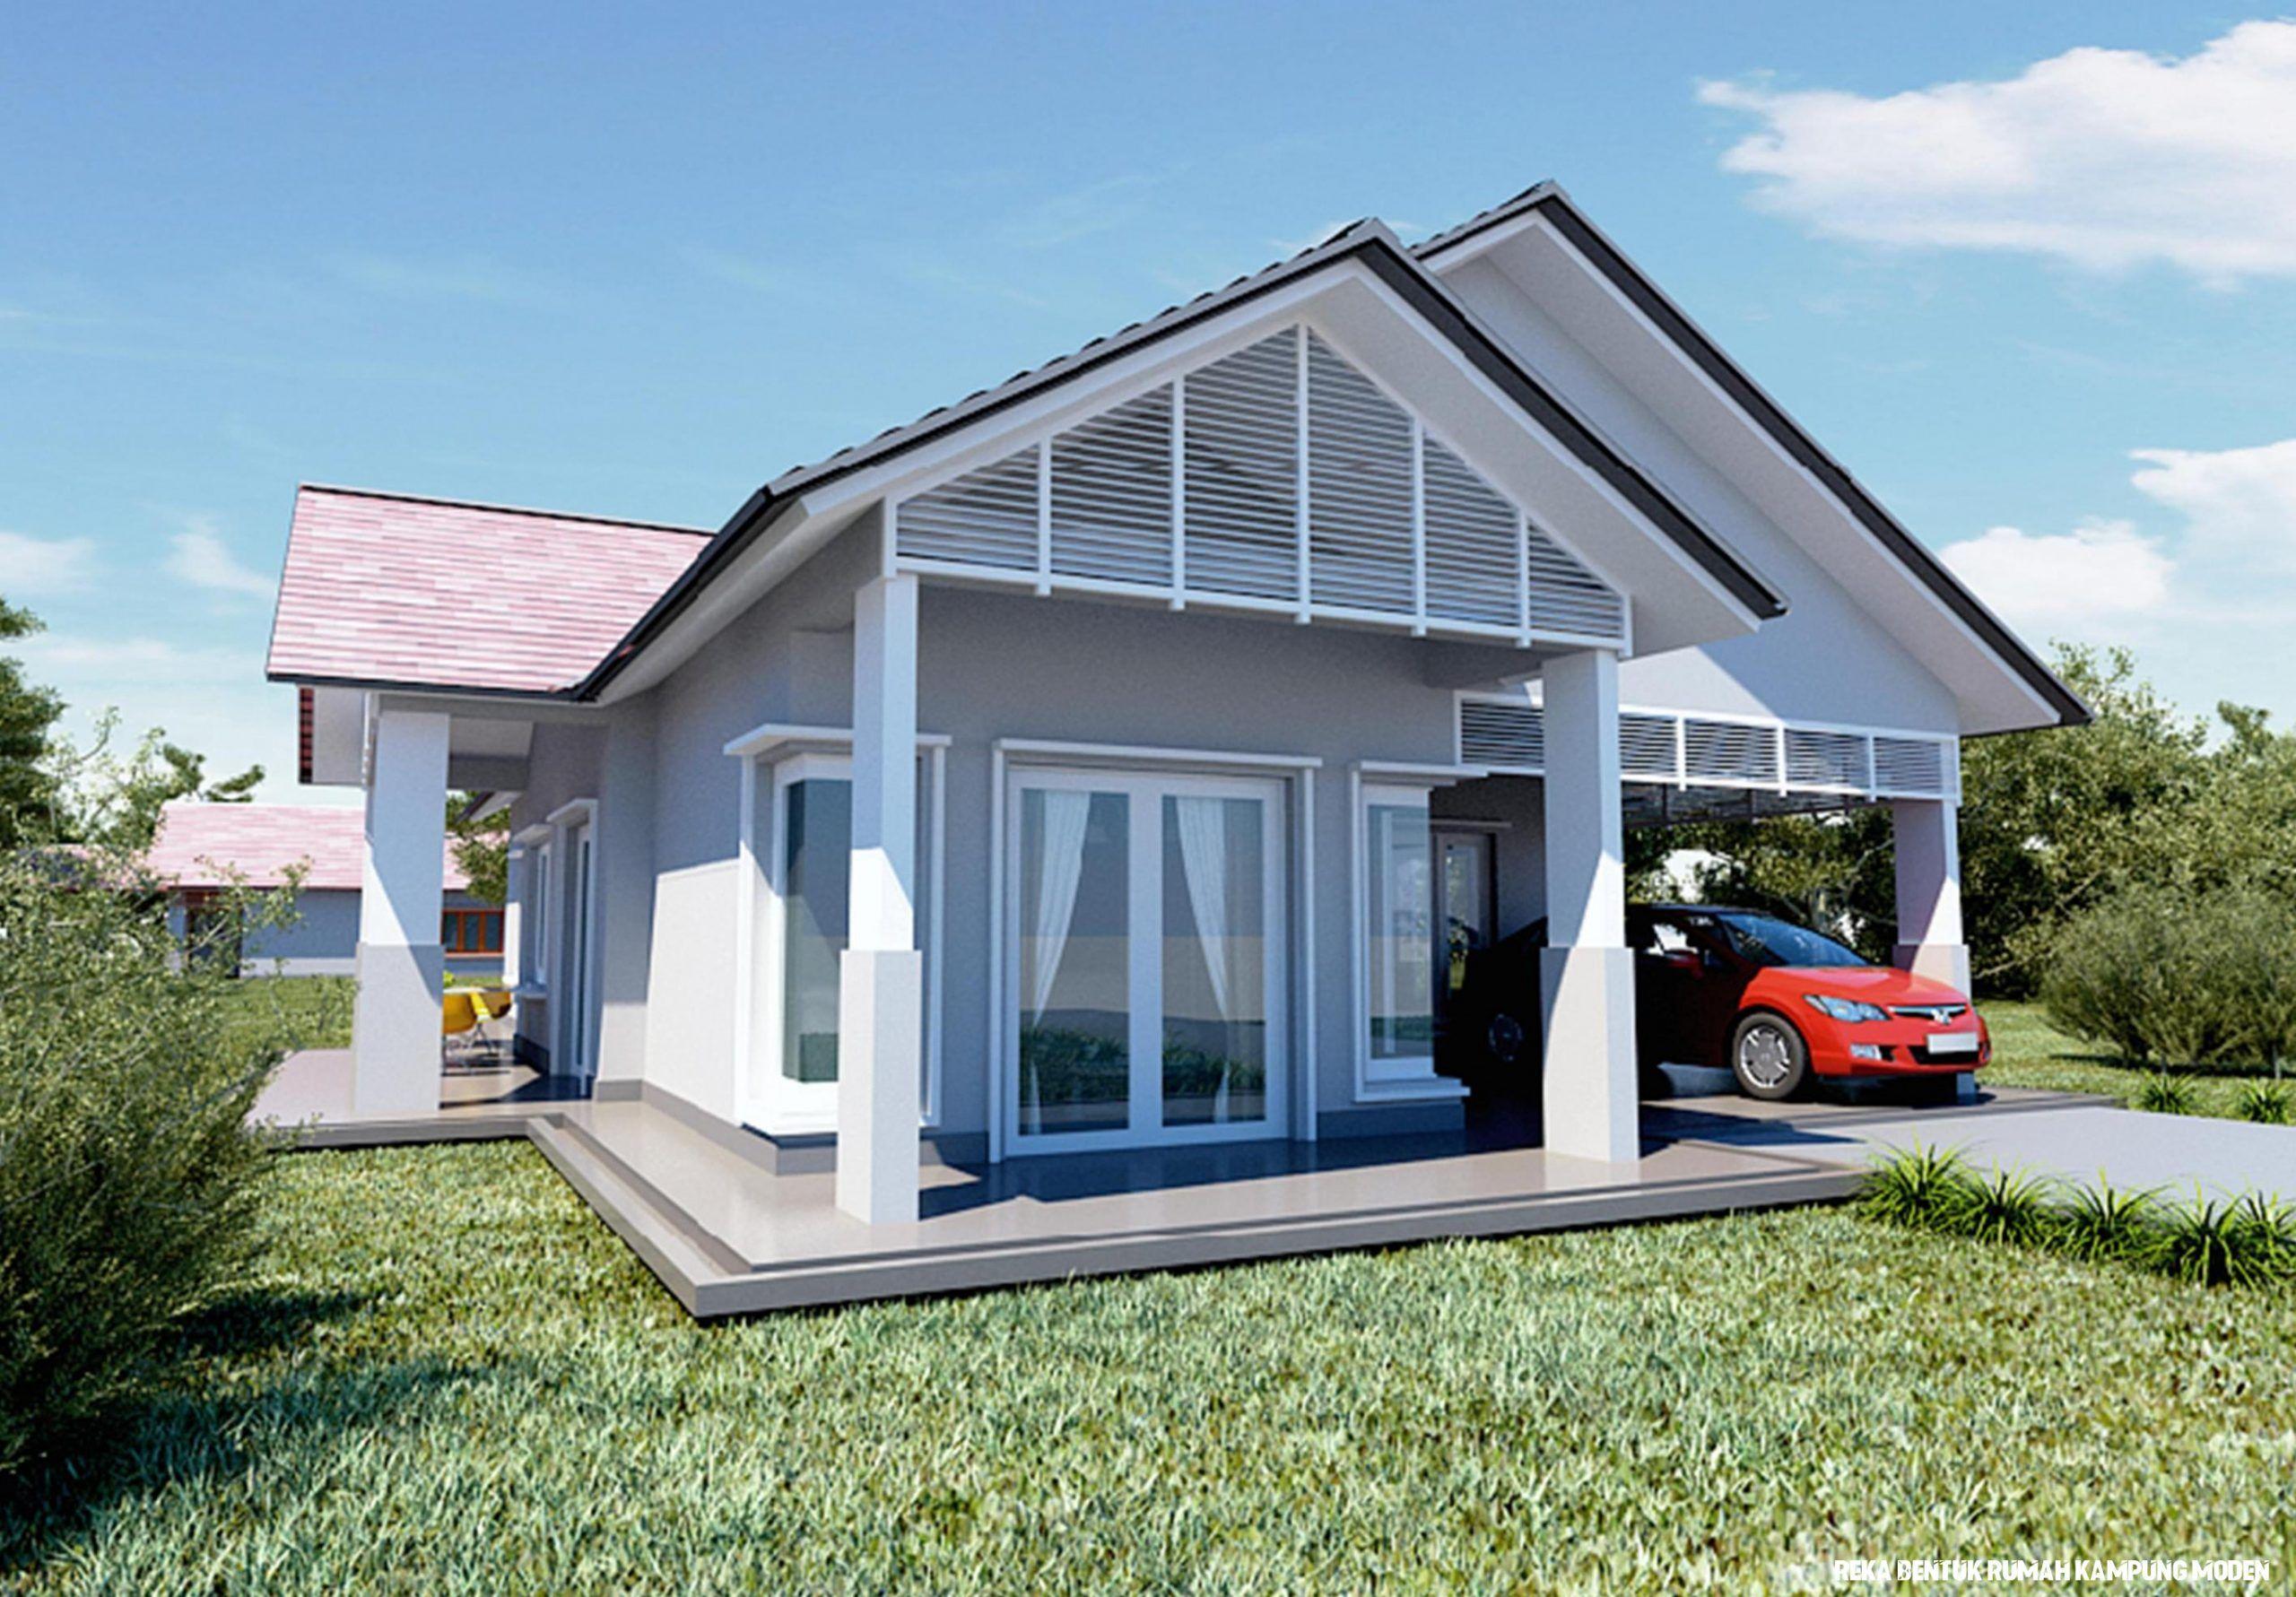 Contoh Idea 22 Fig Yang Terbaik Dari Reka Bentuk Rumah Kampung Moden My Dream Home House Design House Plans